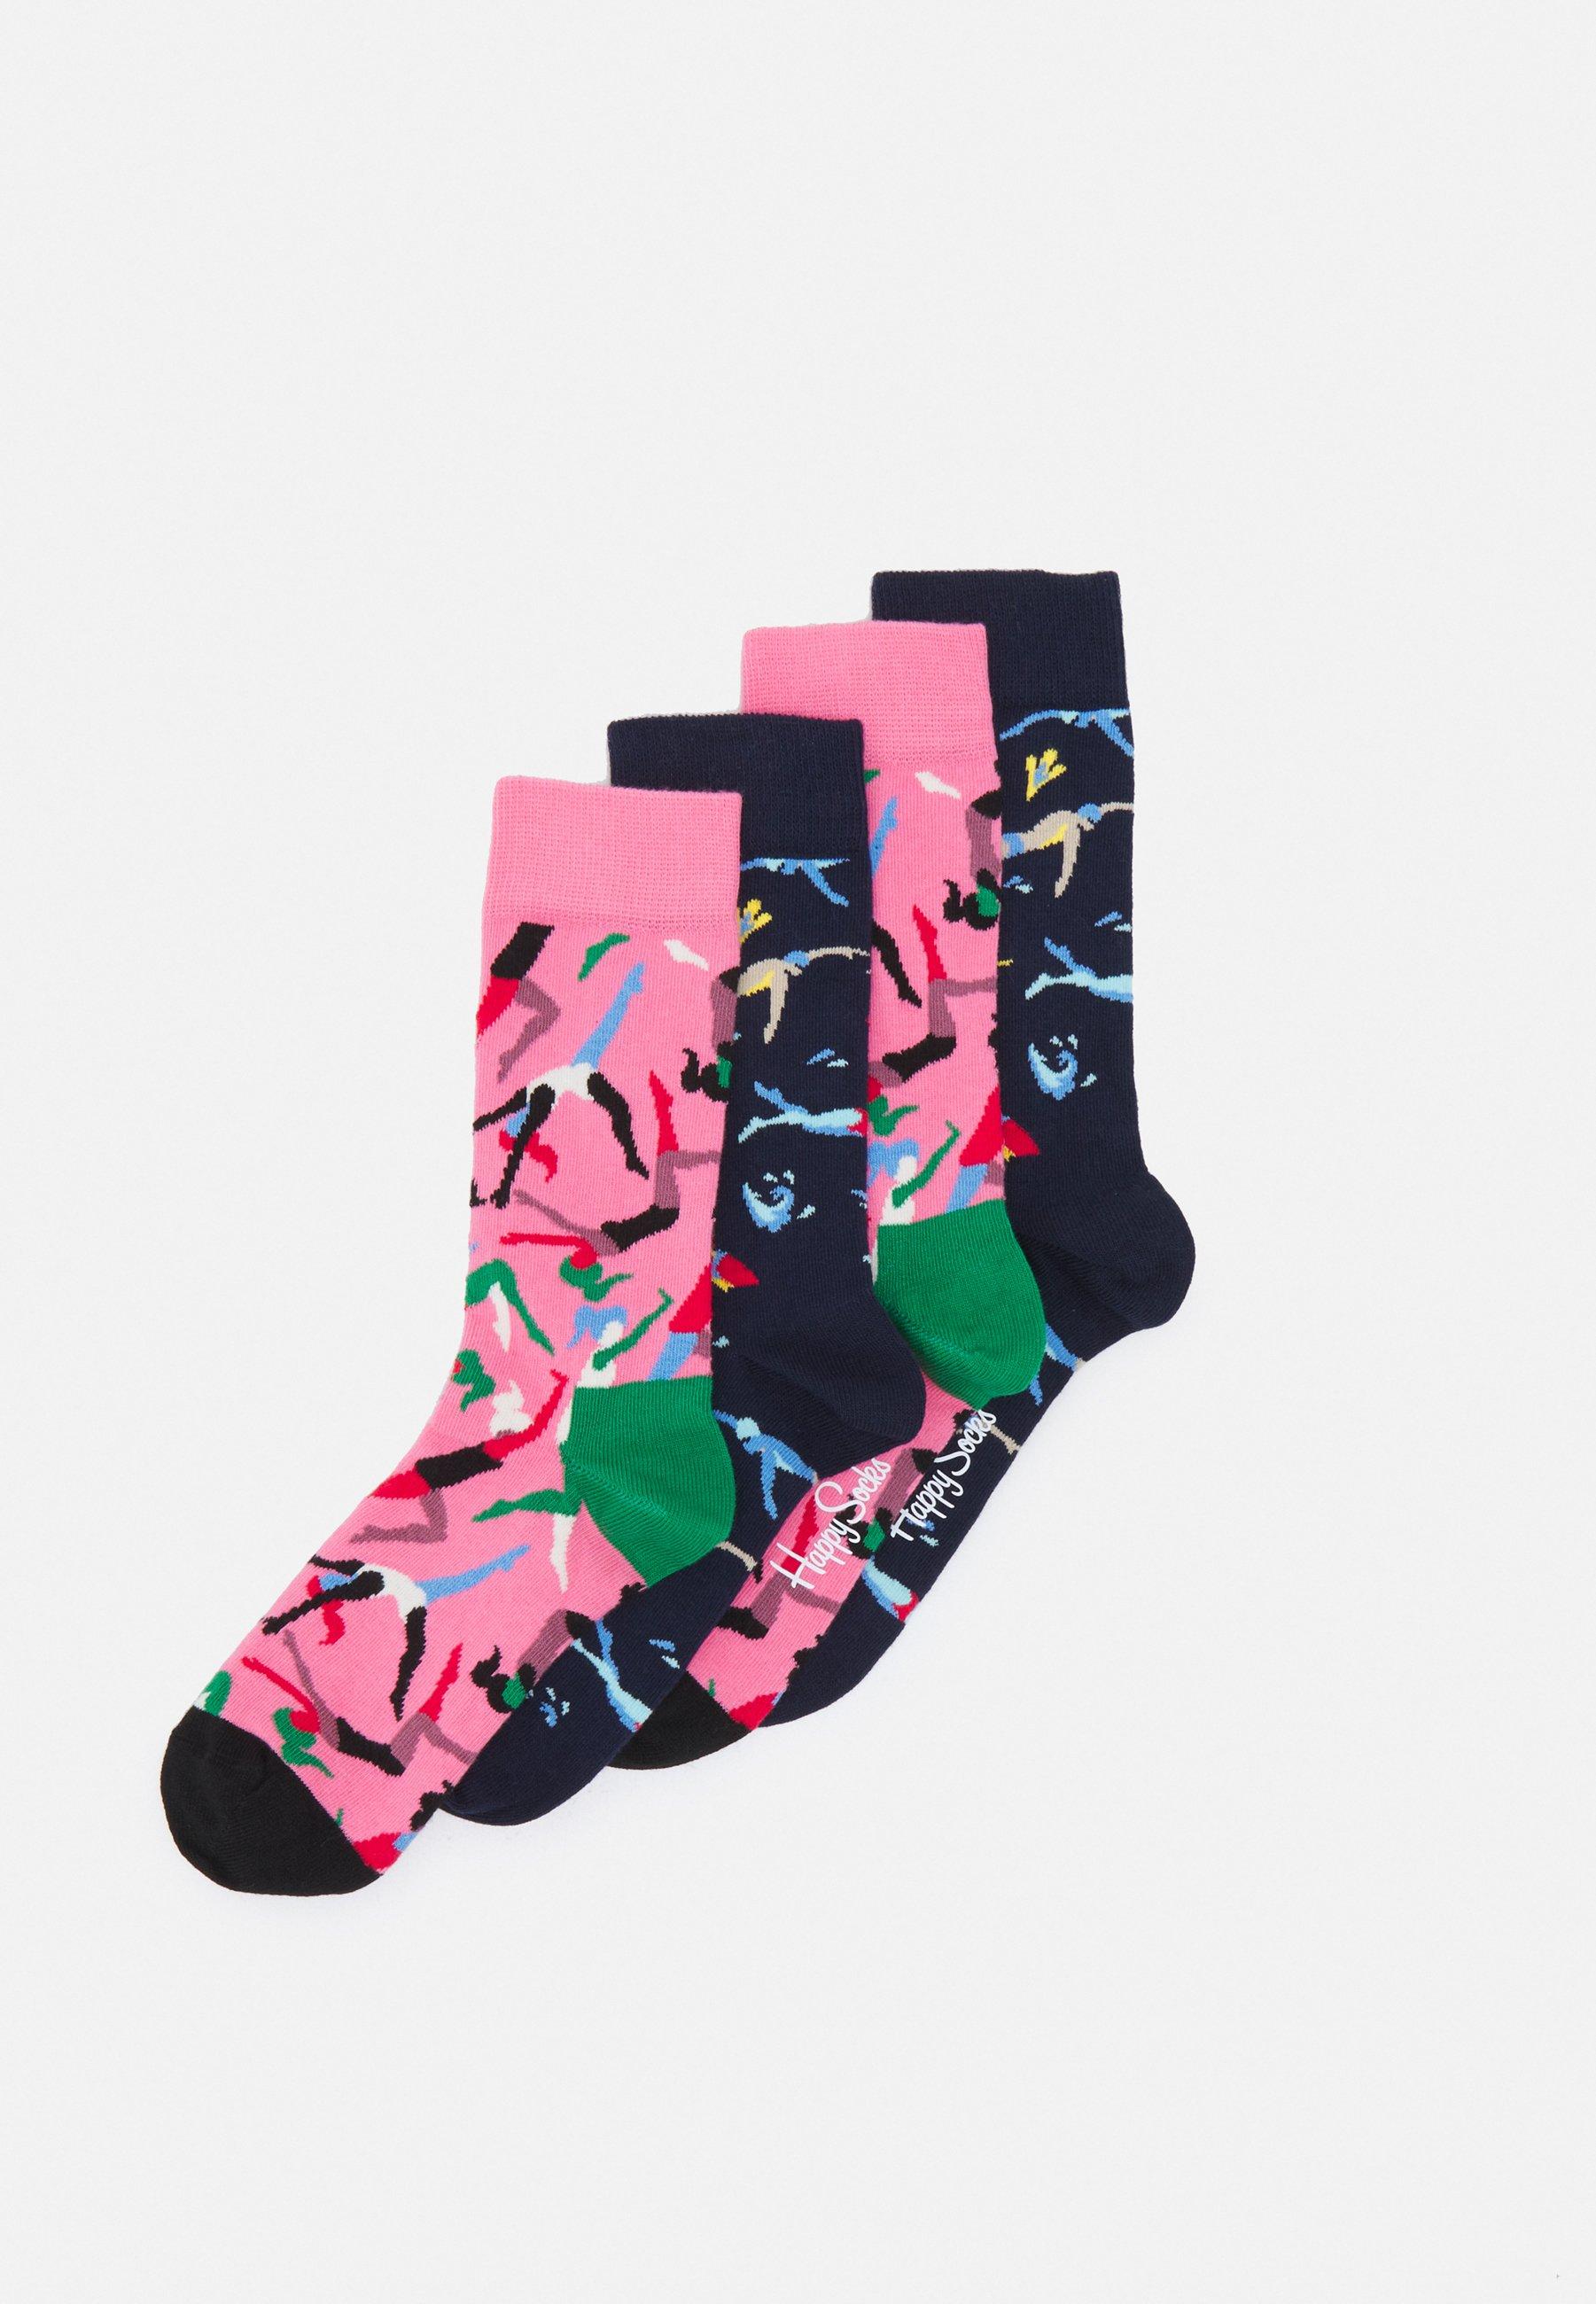 Men GYMNASTICS SOCK SWIMMING SOCK 2 PACK UNISEX - Socks